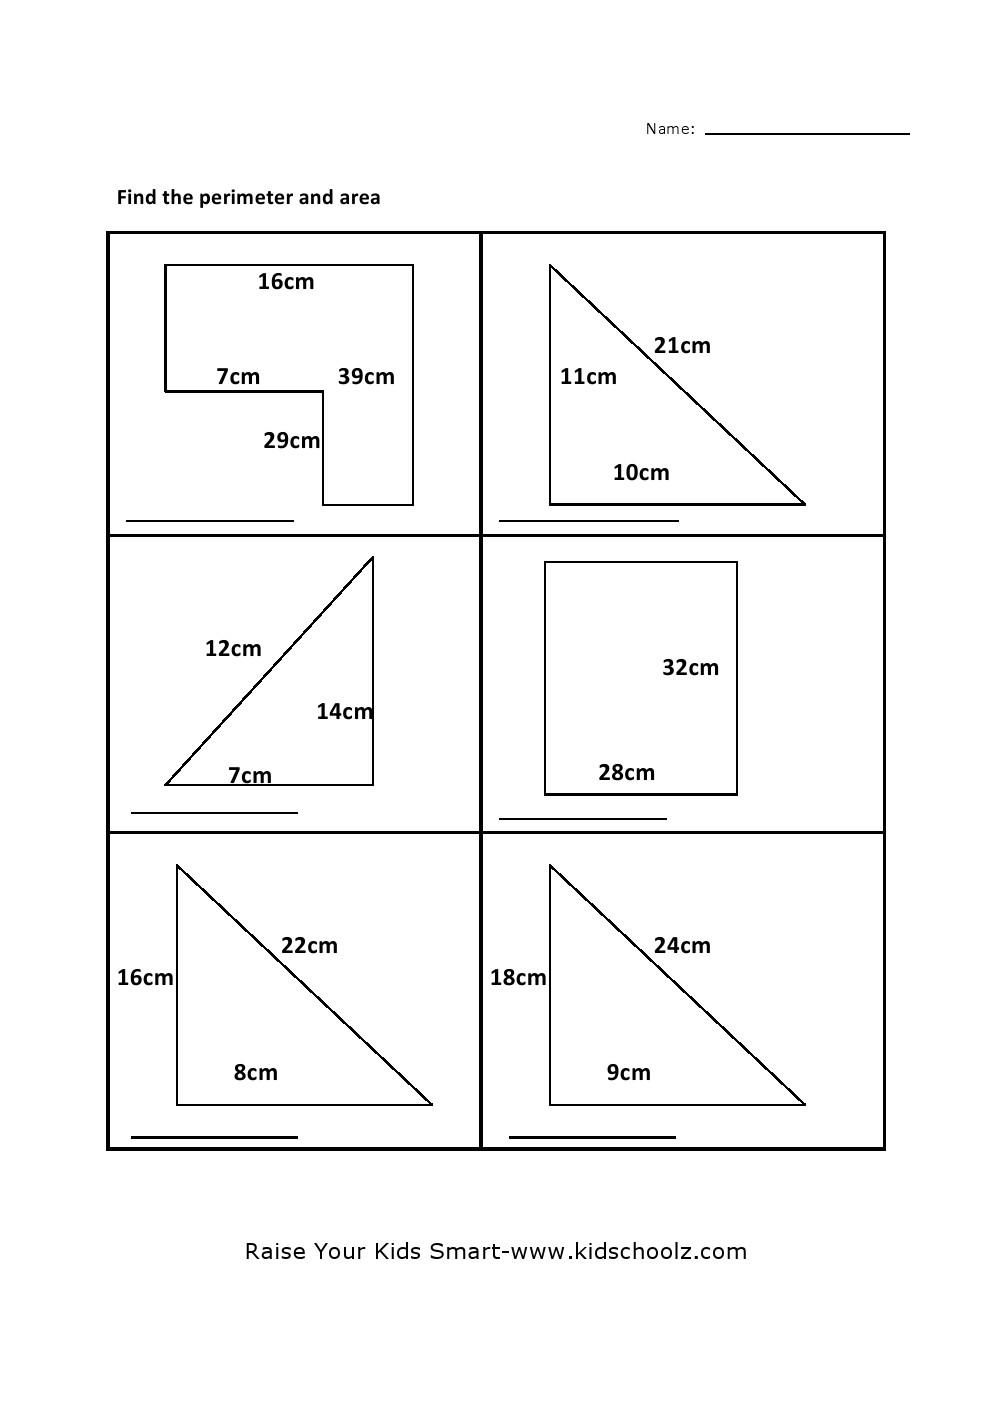 worksheet Perimeter Worksheet grade 5 perimeter area worksheet 2 worksheet